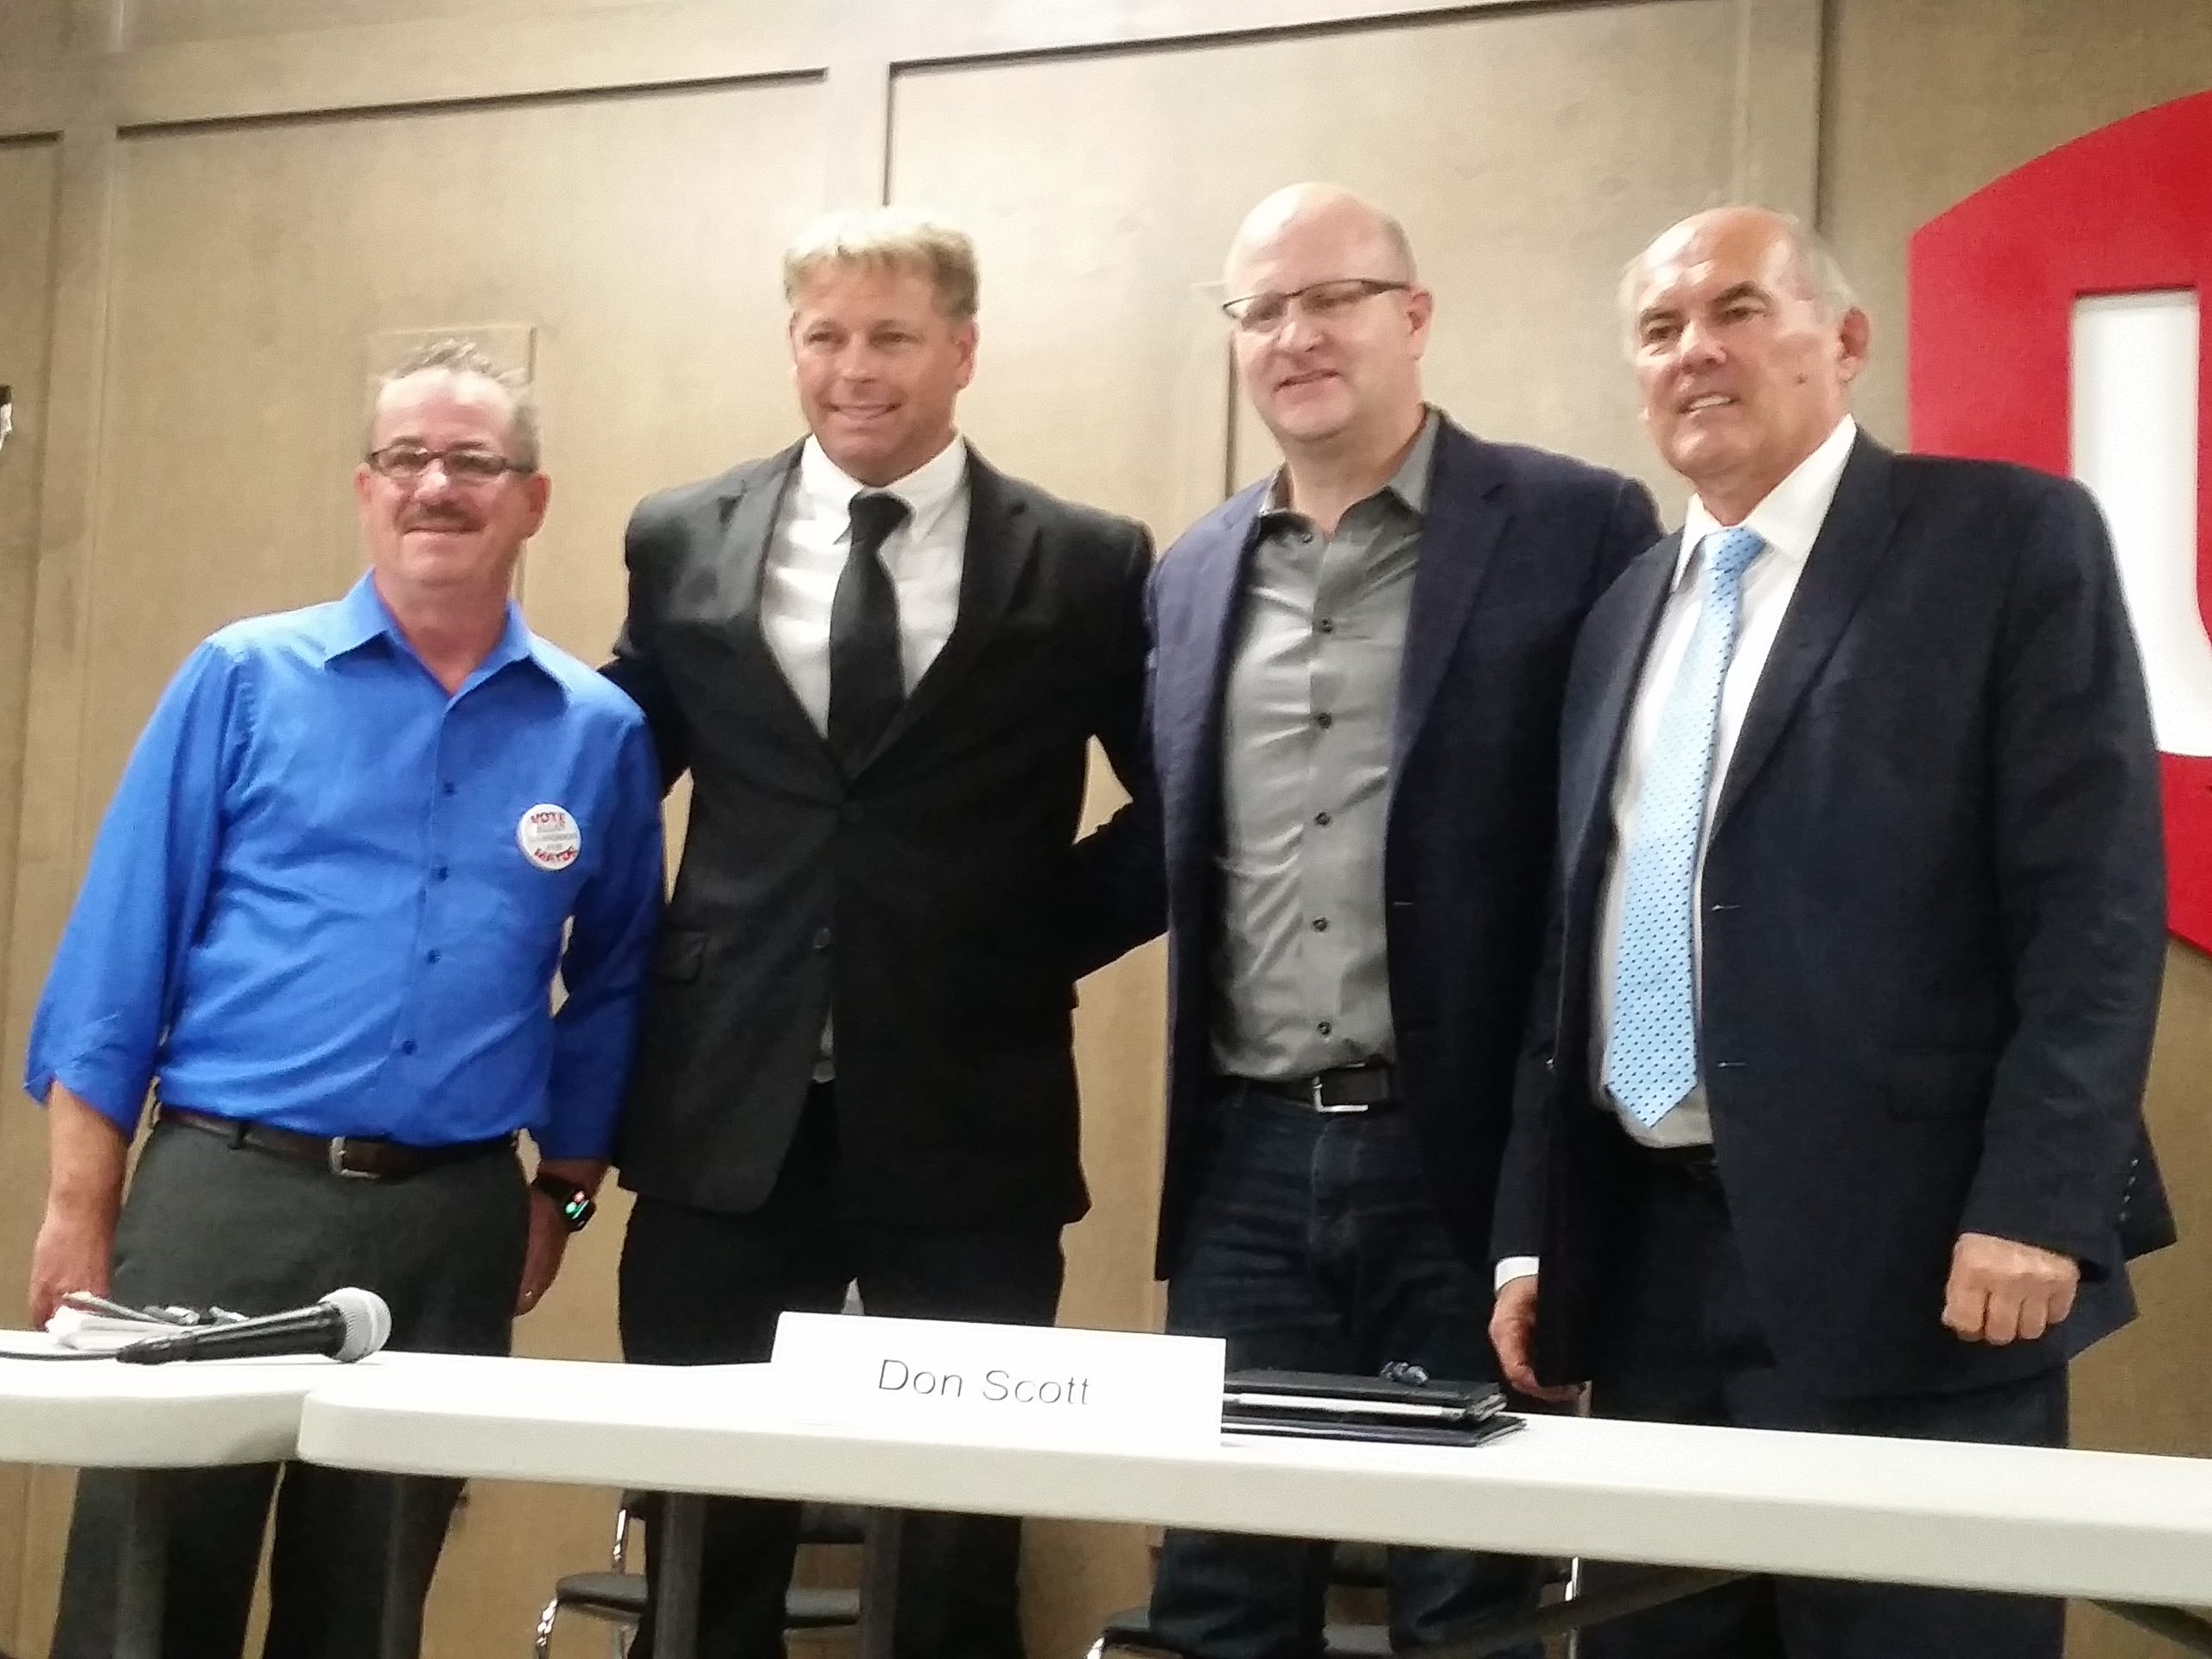 Mayoral Candidates Express Ideas To Help Rural Communities In Third Debate